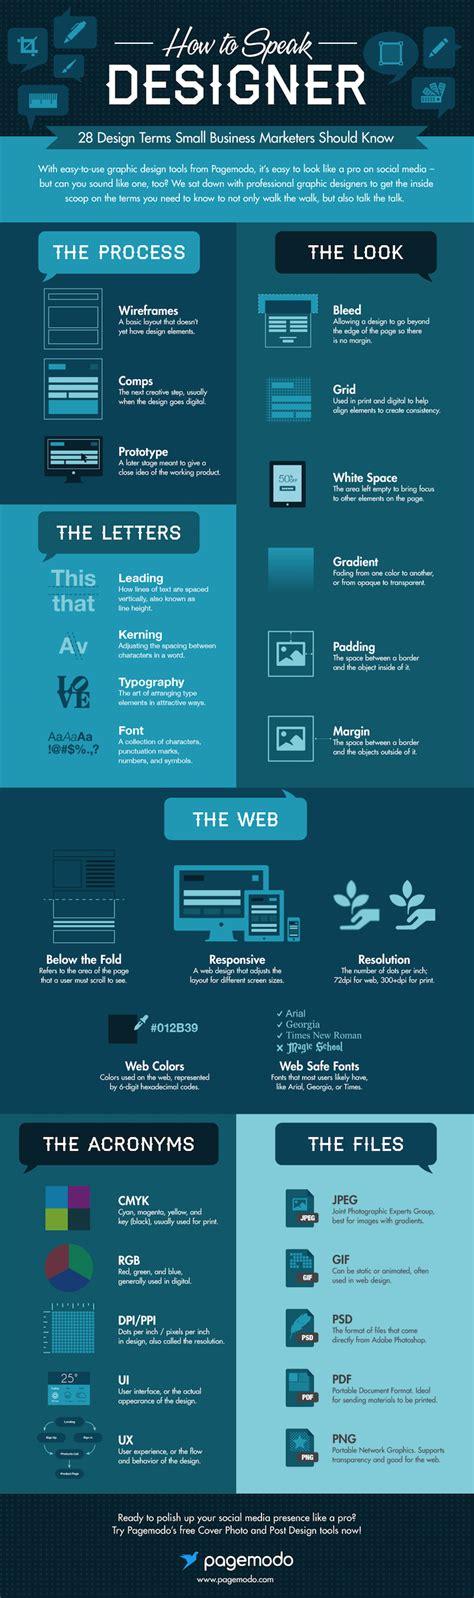 ui pattern terminology how to speak designer doodle pod design print